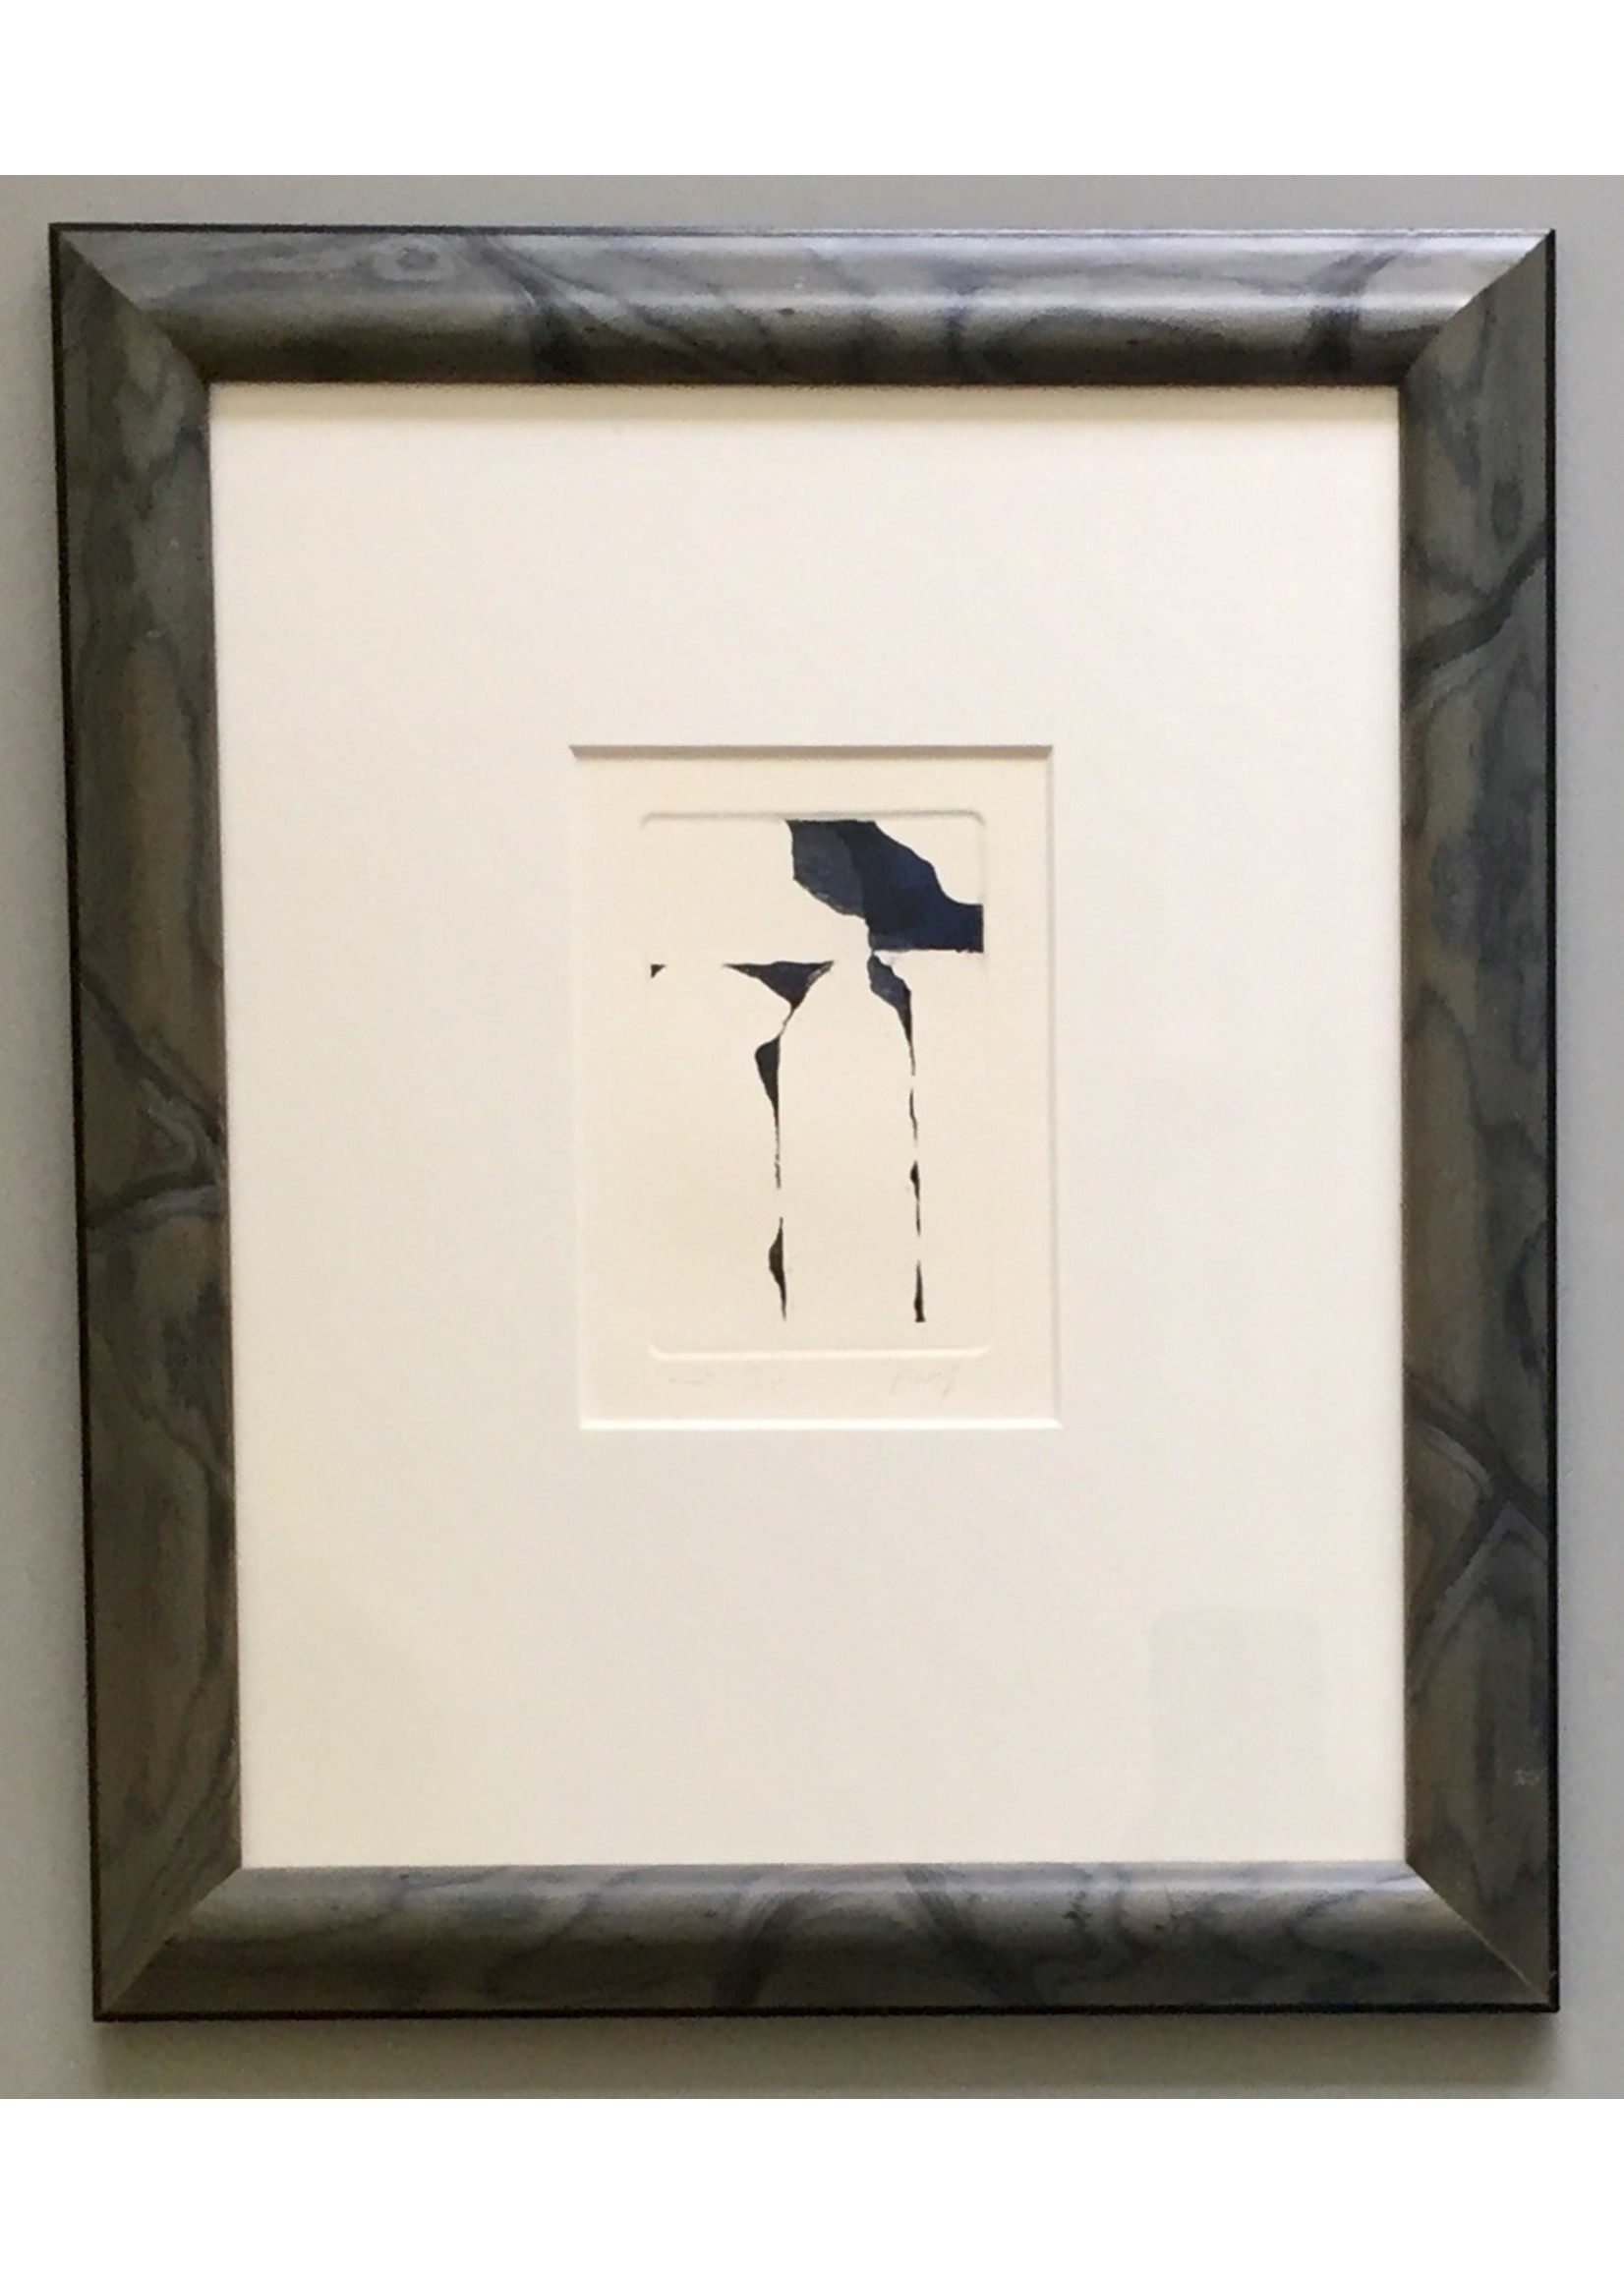 Egypt' - Adri Frigge (etching)